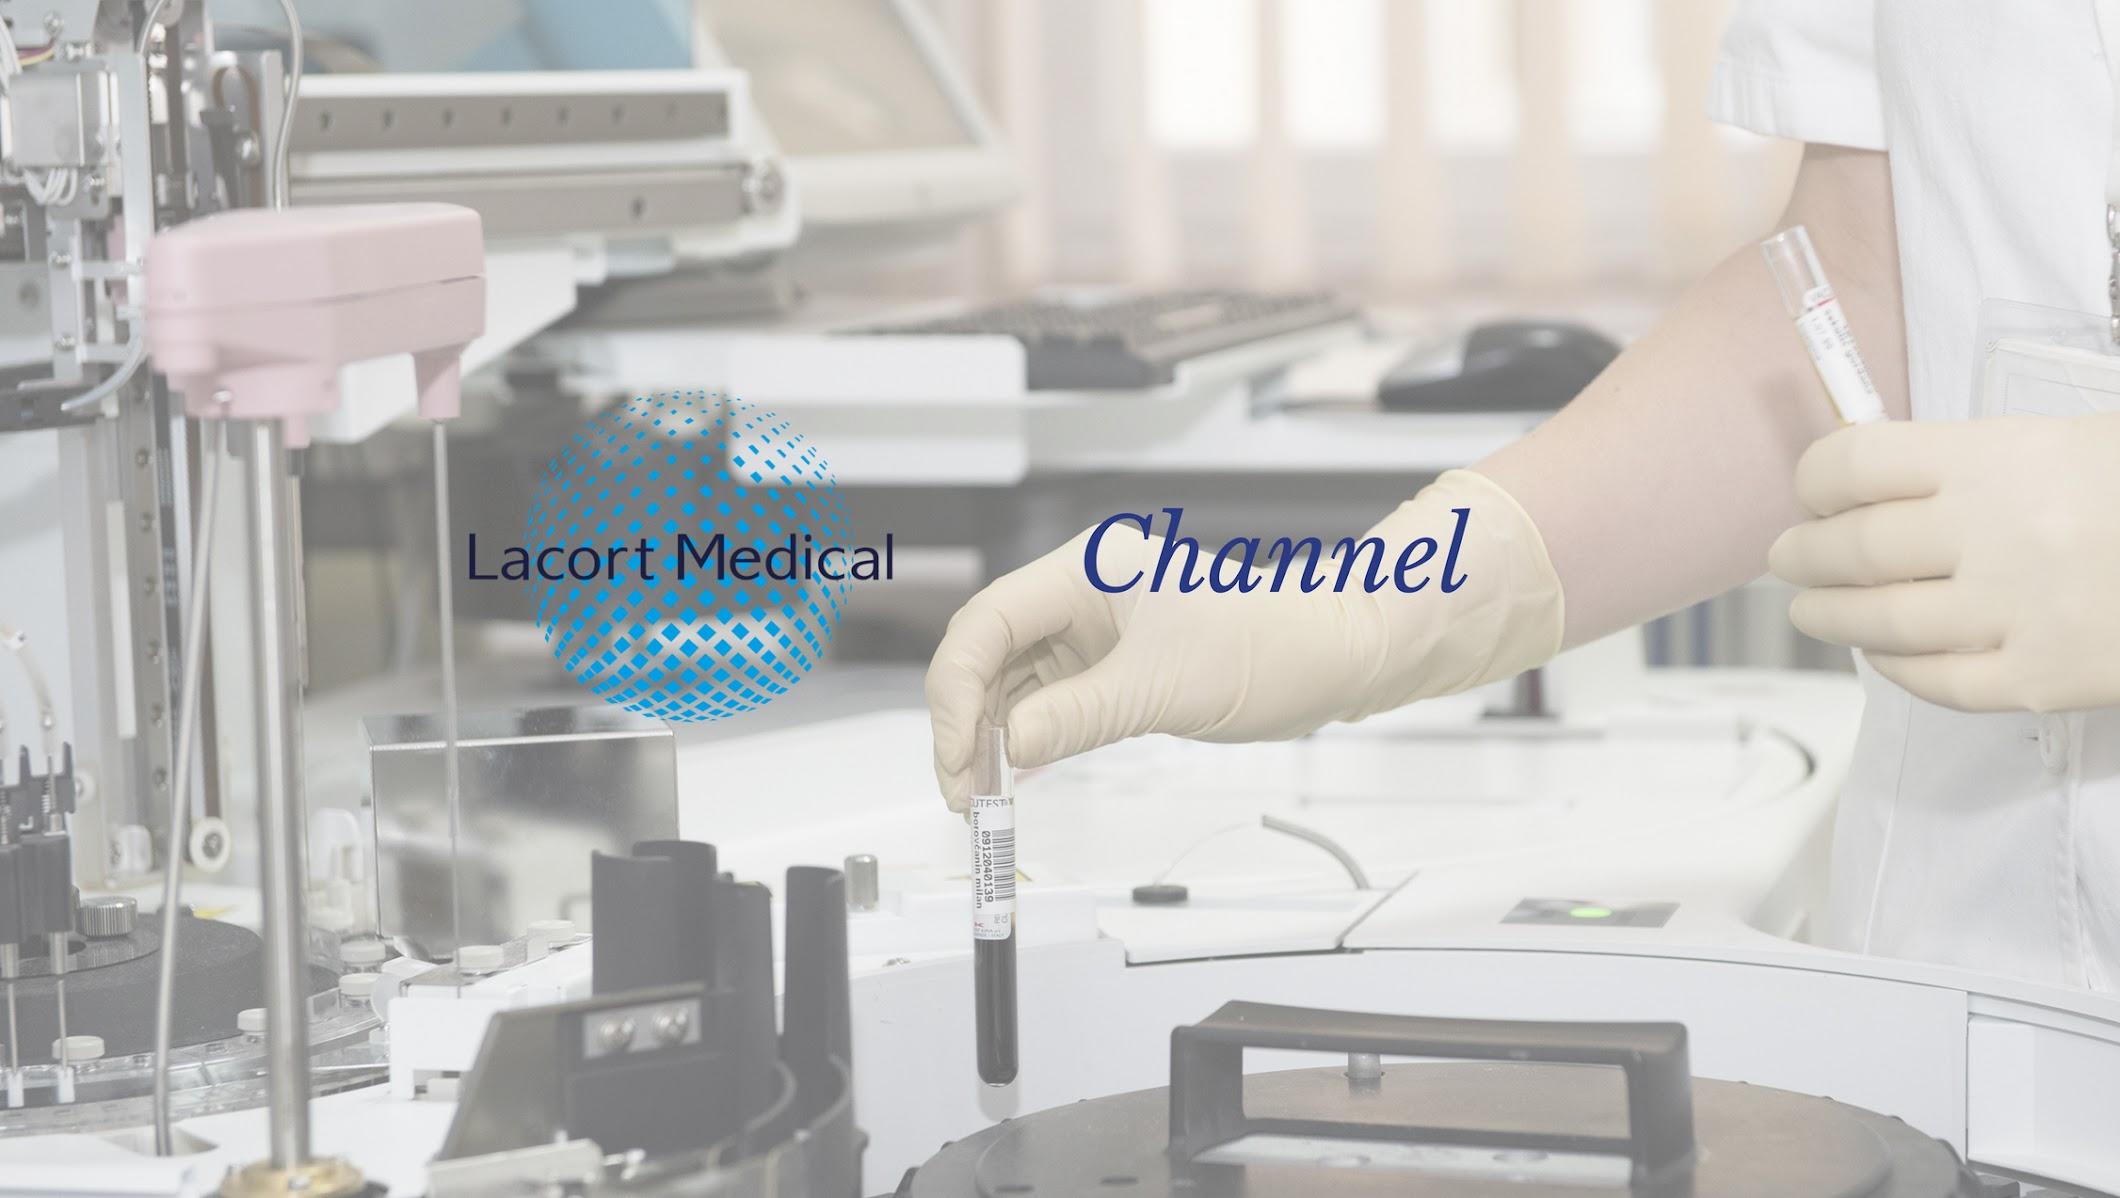 Lacort Medical